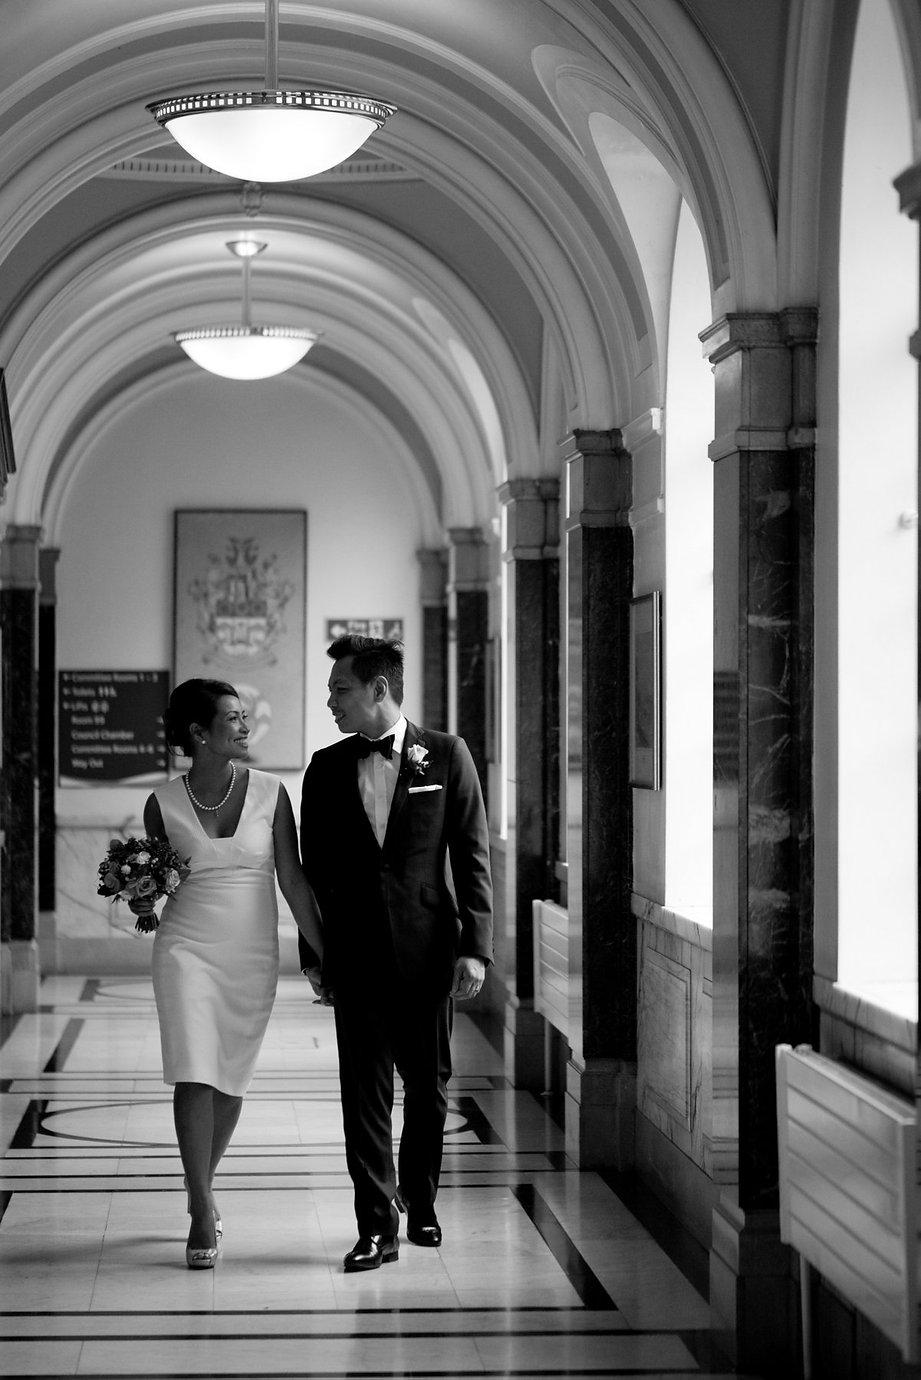 Islington Town Hall Wedding captured by London based Wedding Photographer, Grace Pham.